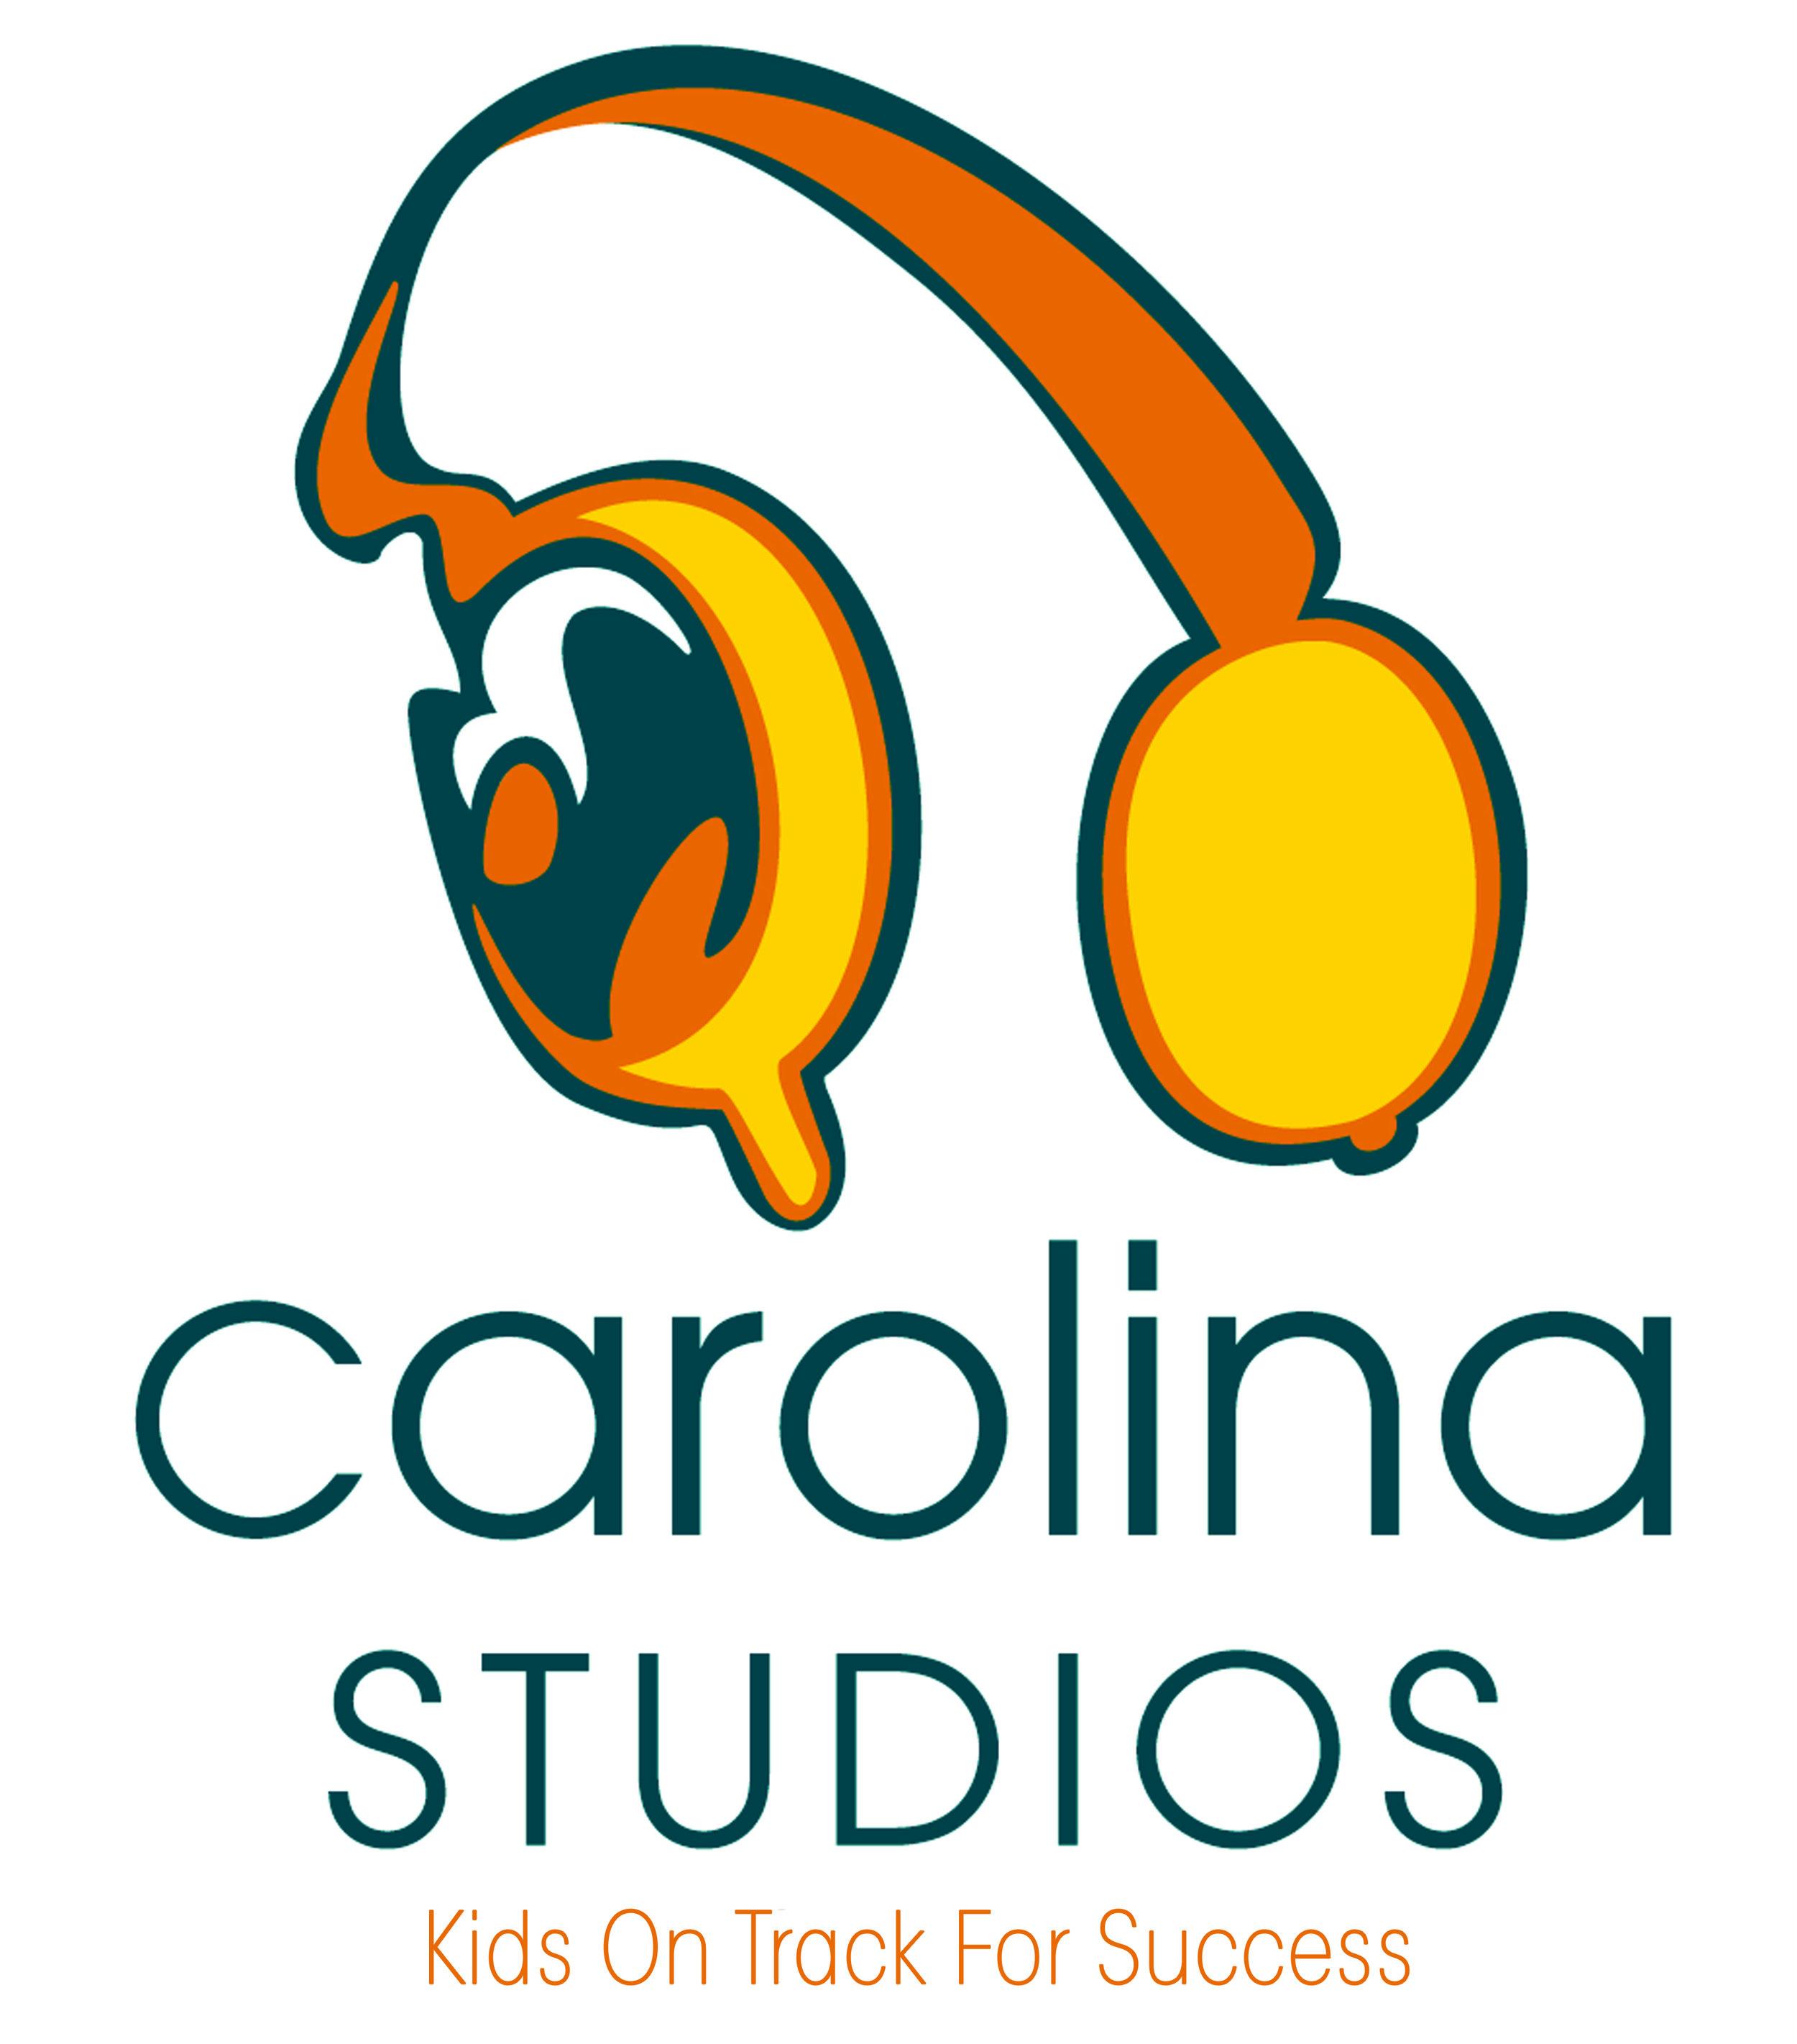 carolina studios logo 1.jpg